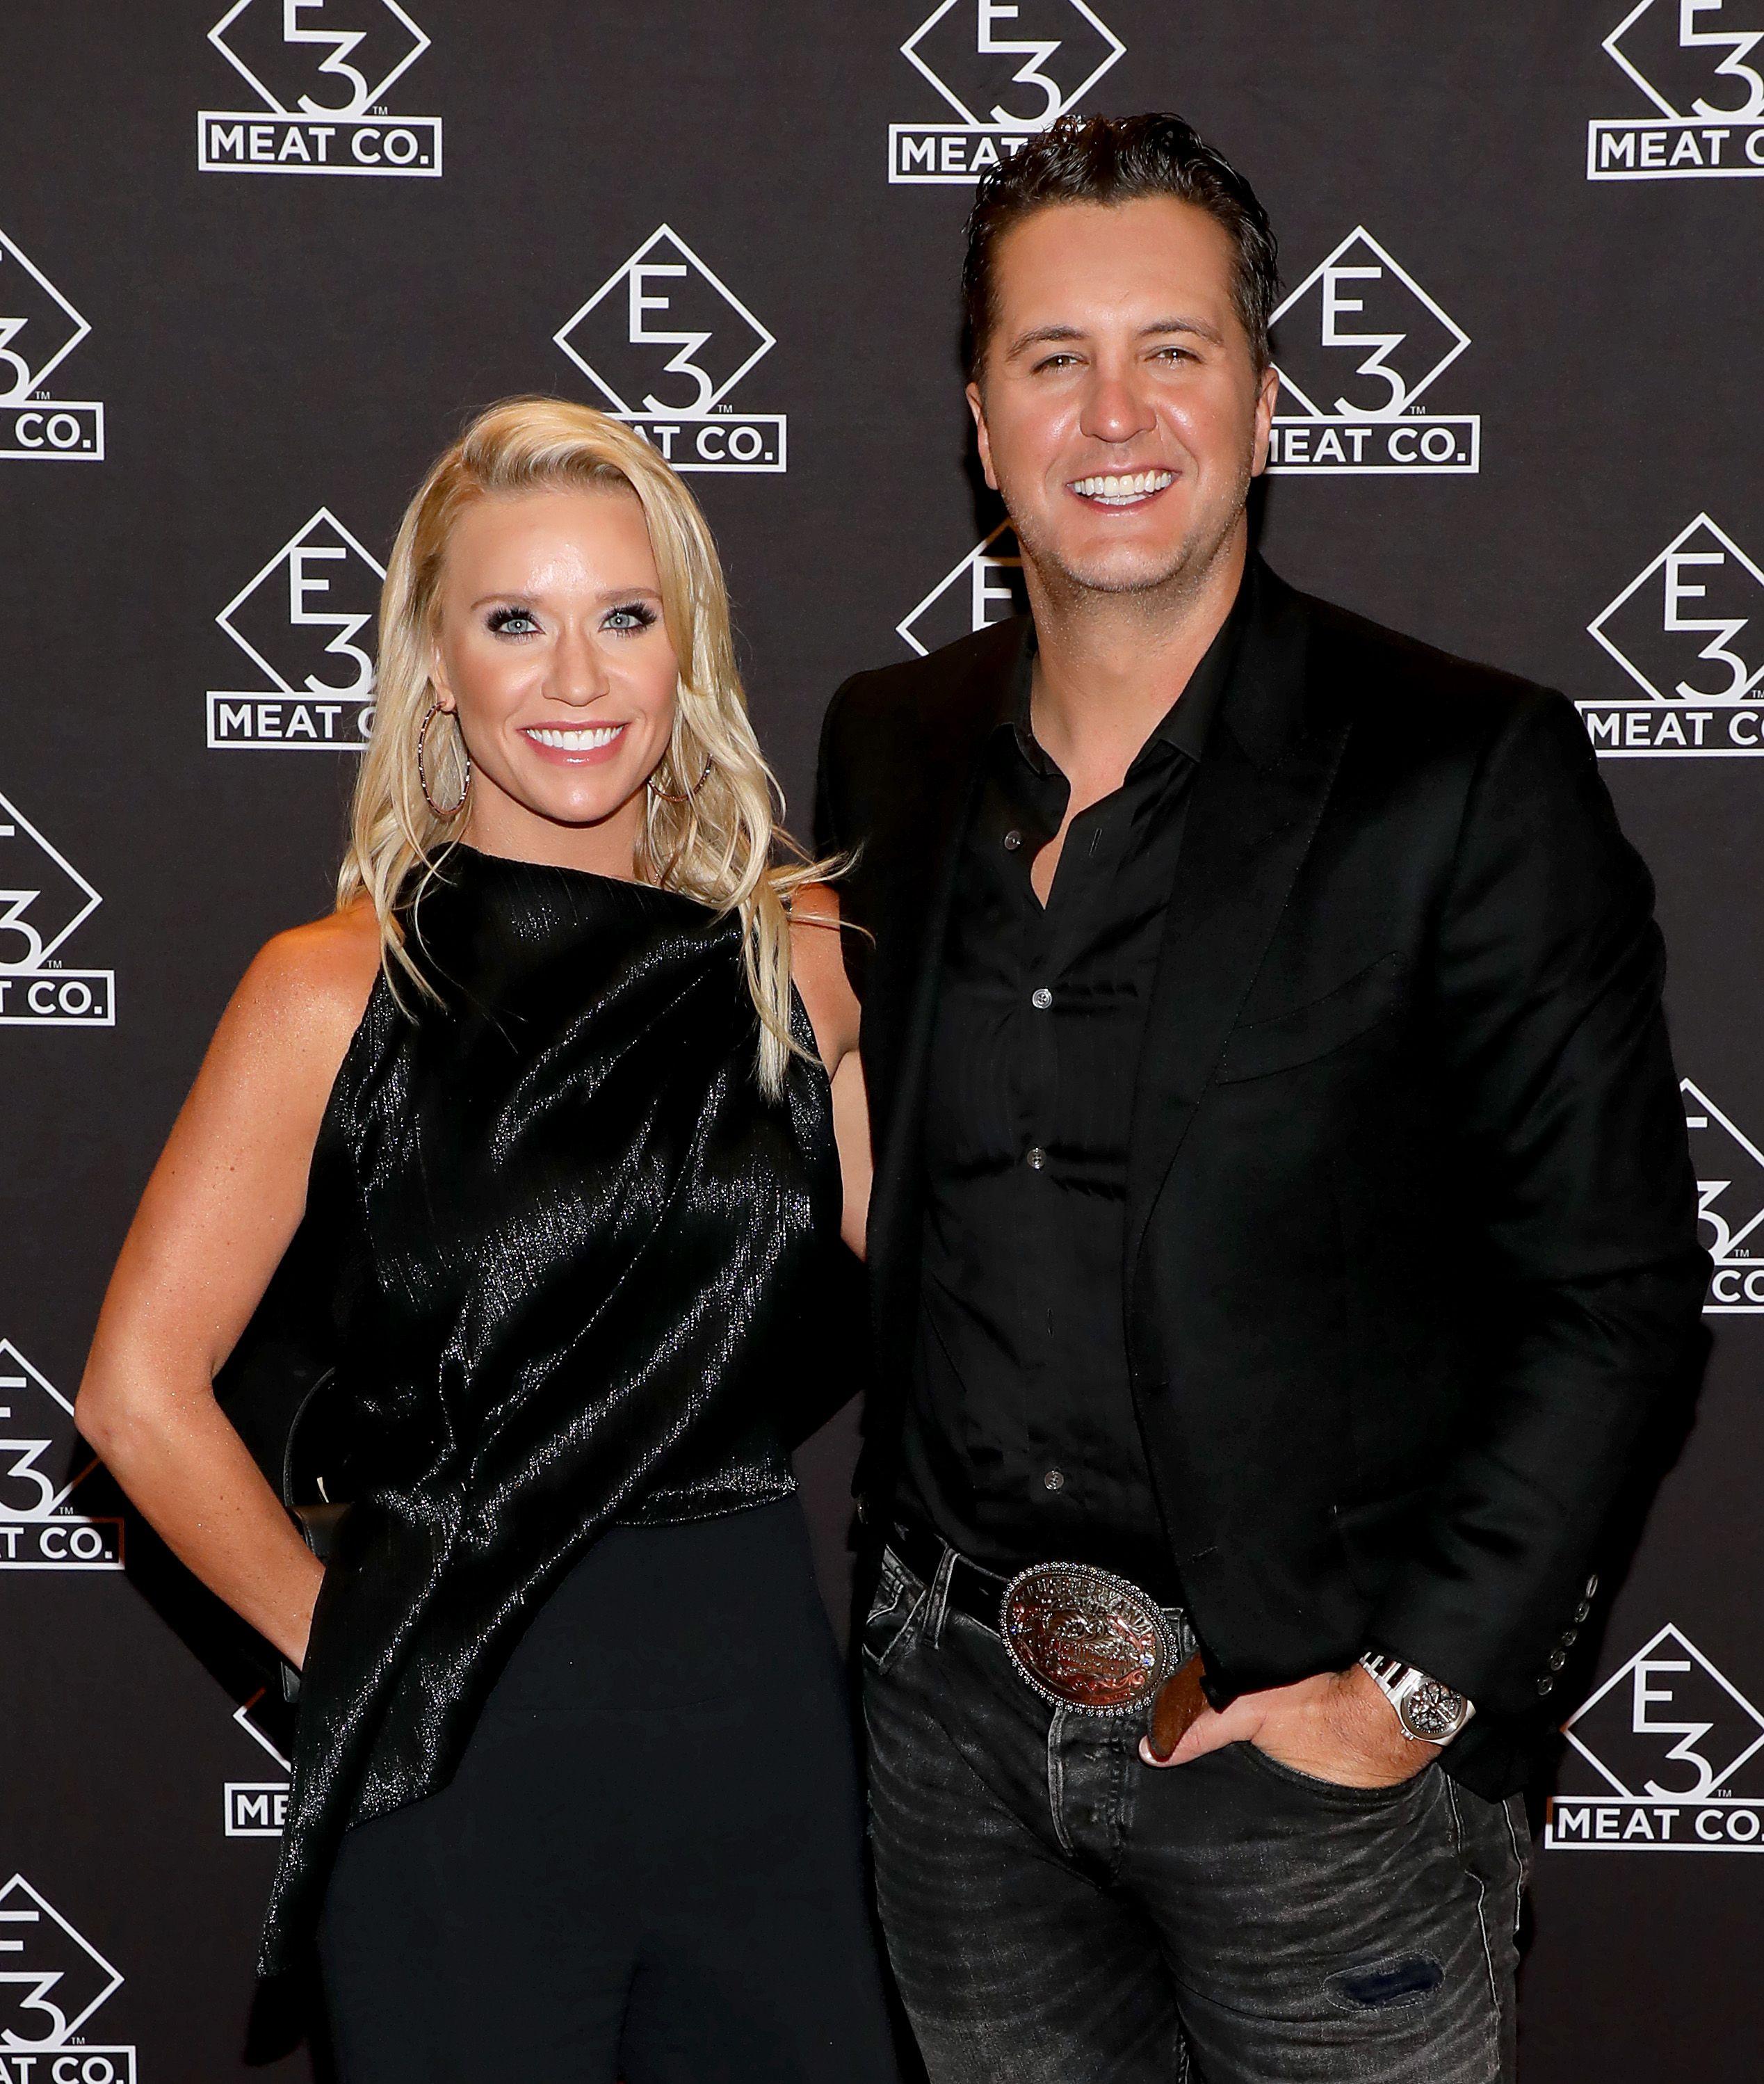 Luke Bryan and his wife Caroline Boyer